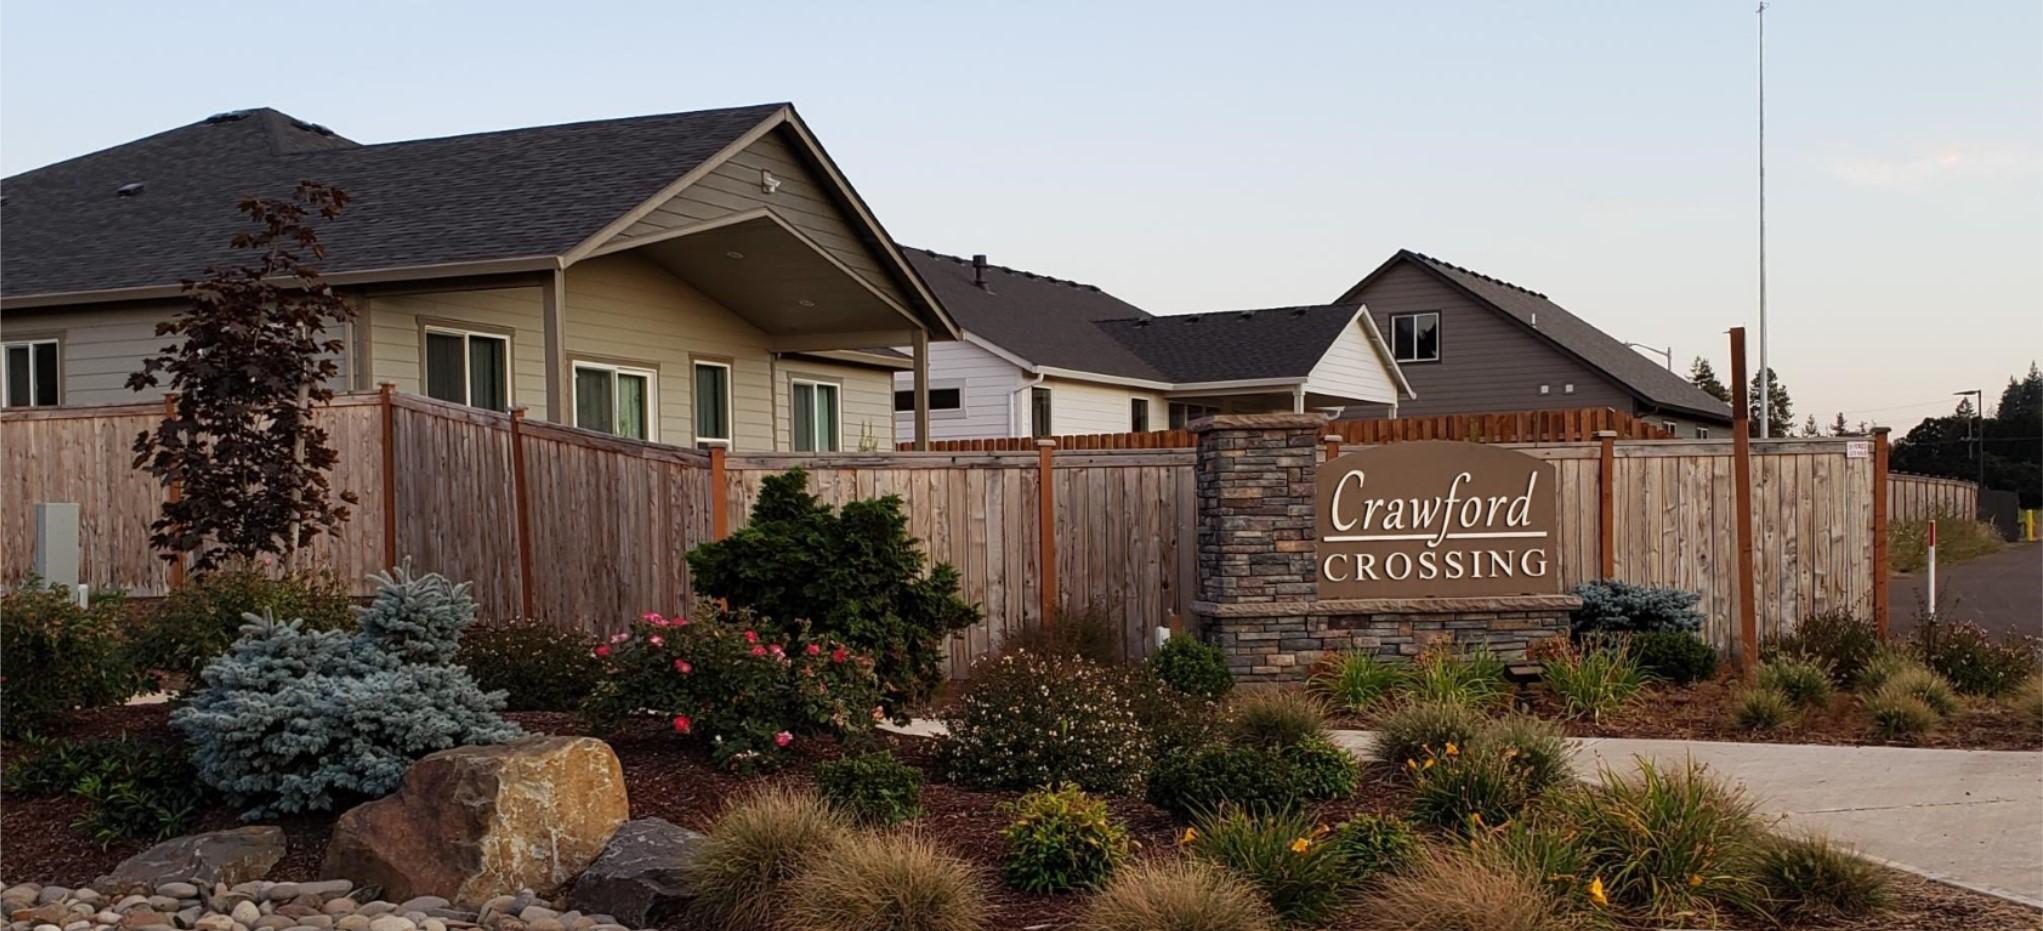 Crawford Crossing